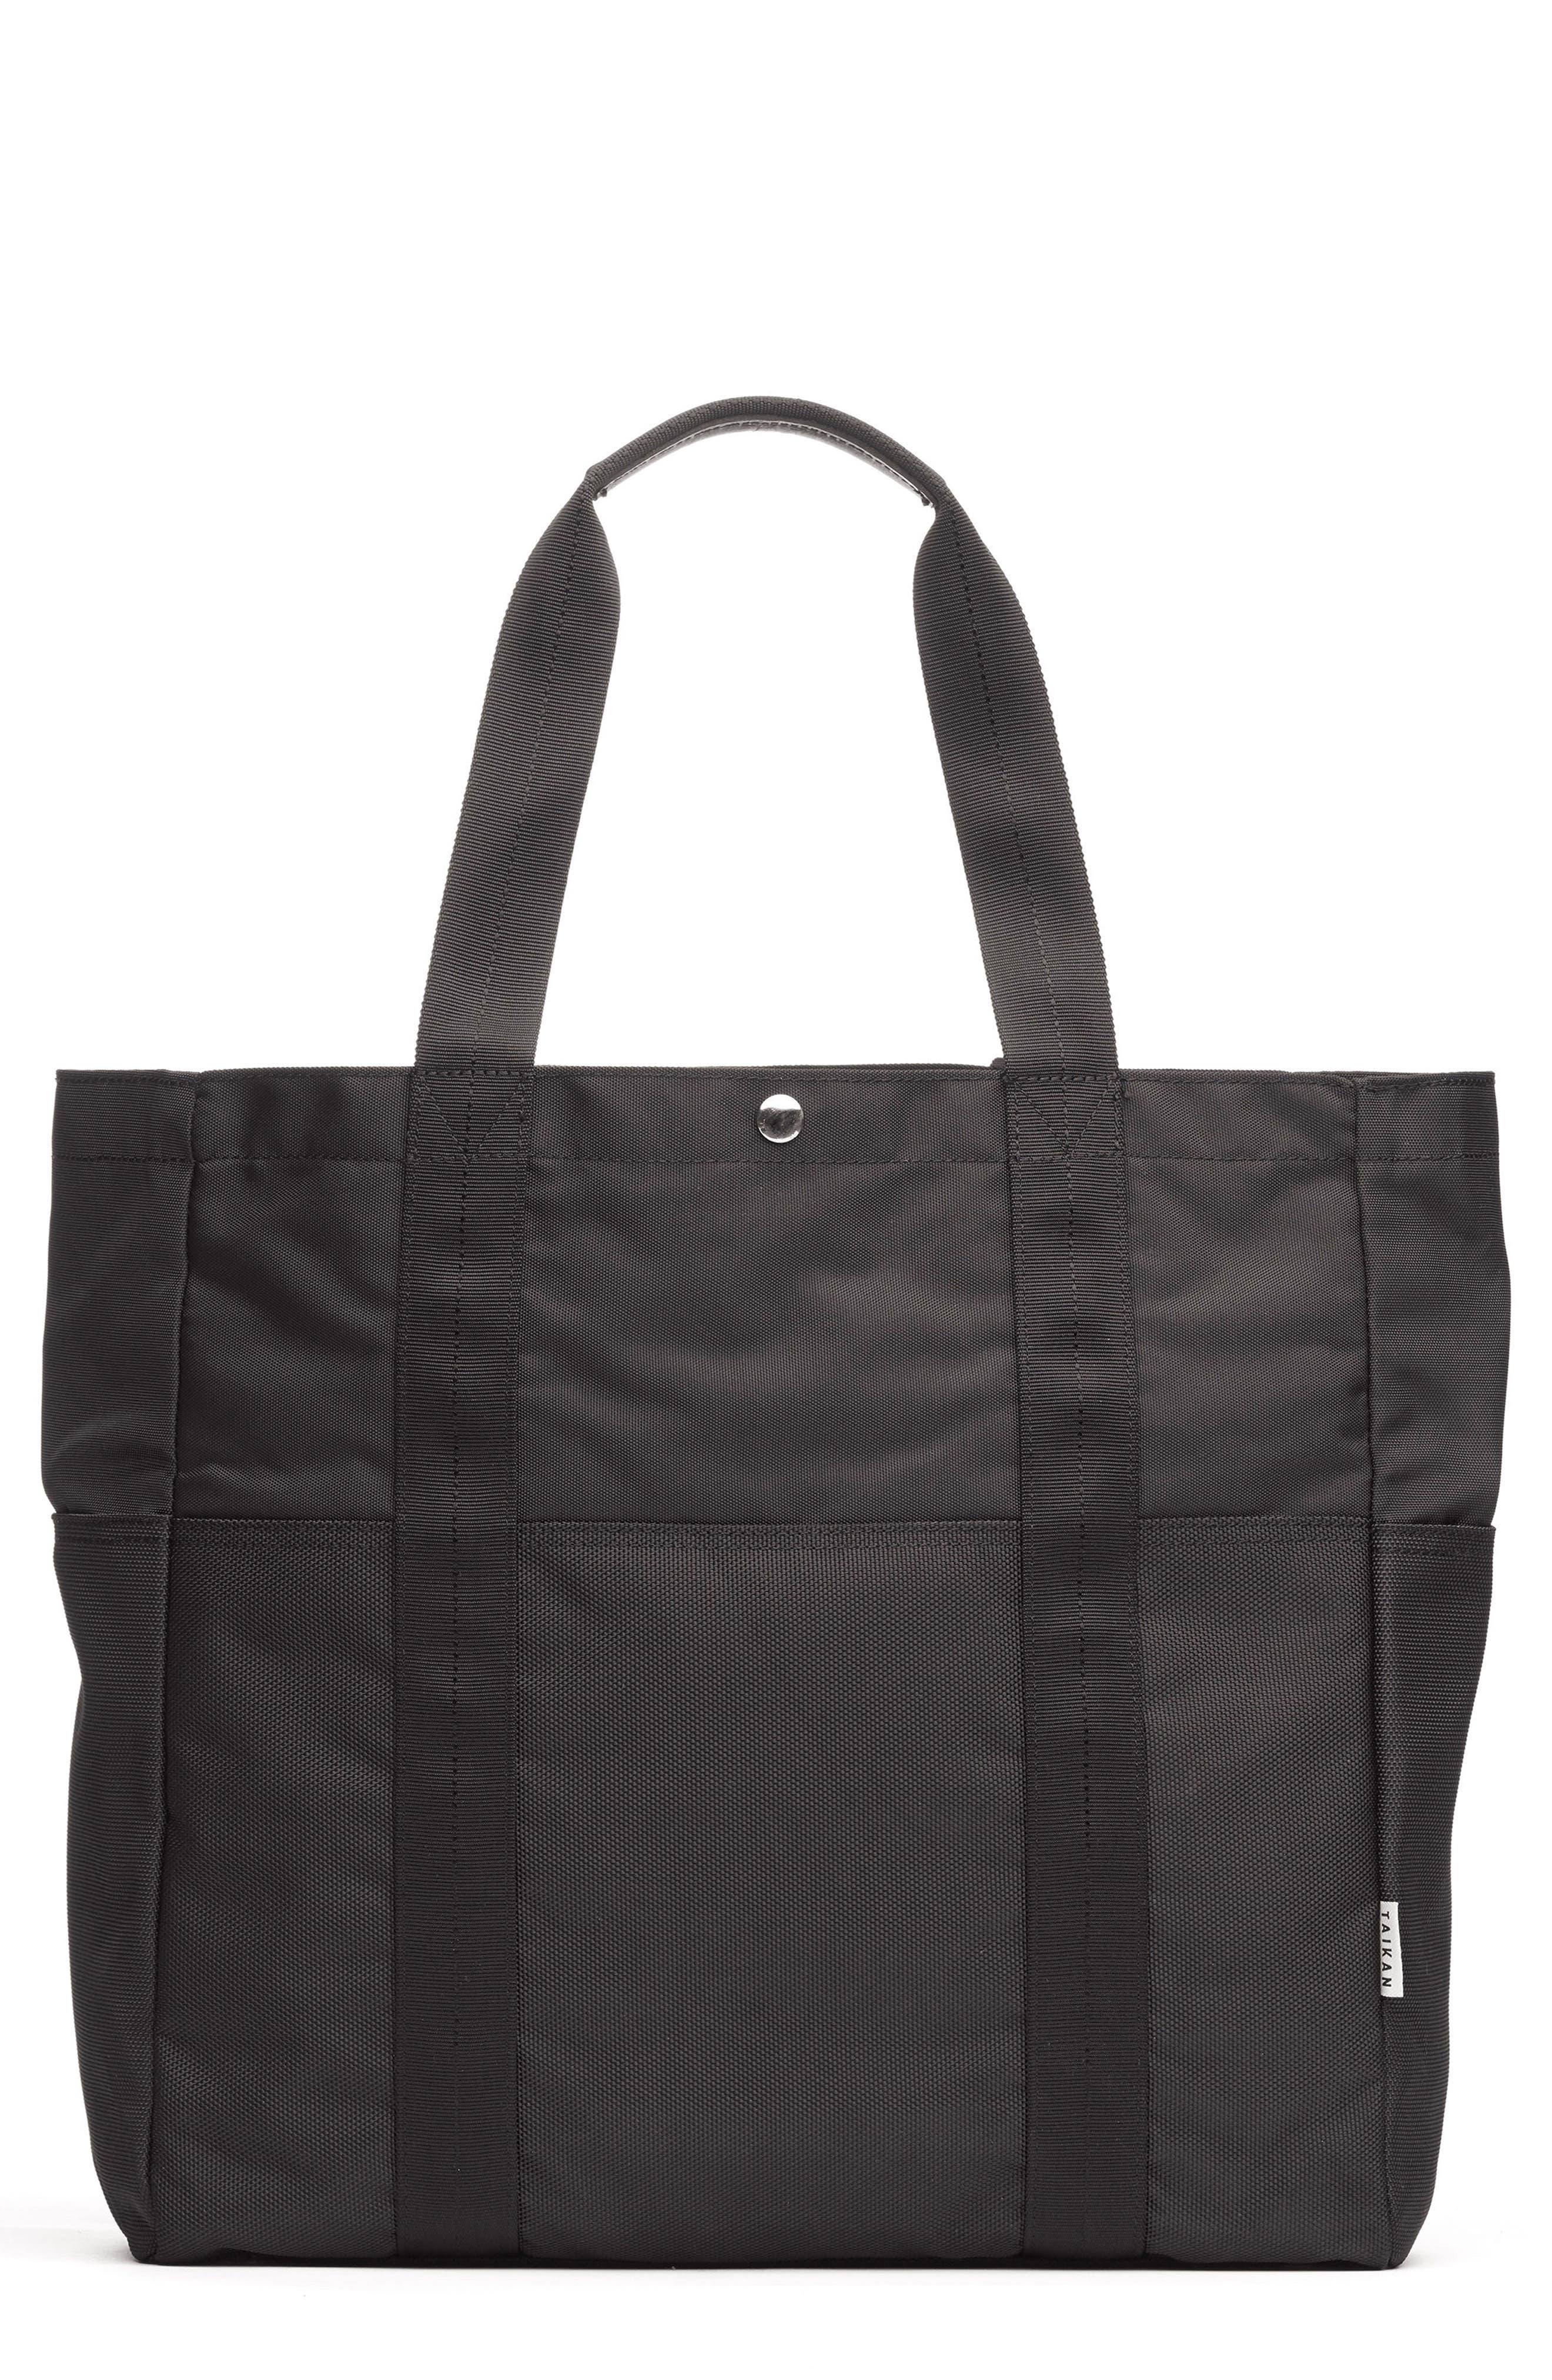 Tote Bag,                         Main,                         color, Matte Black